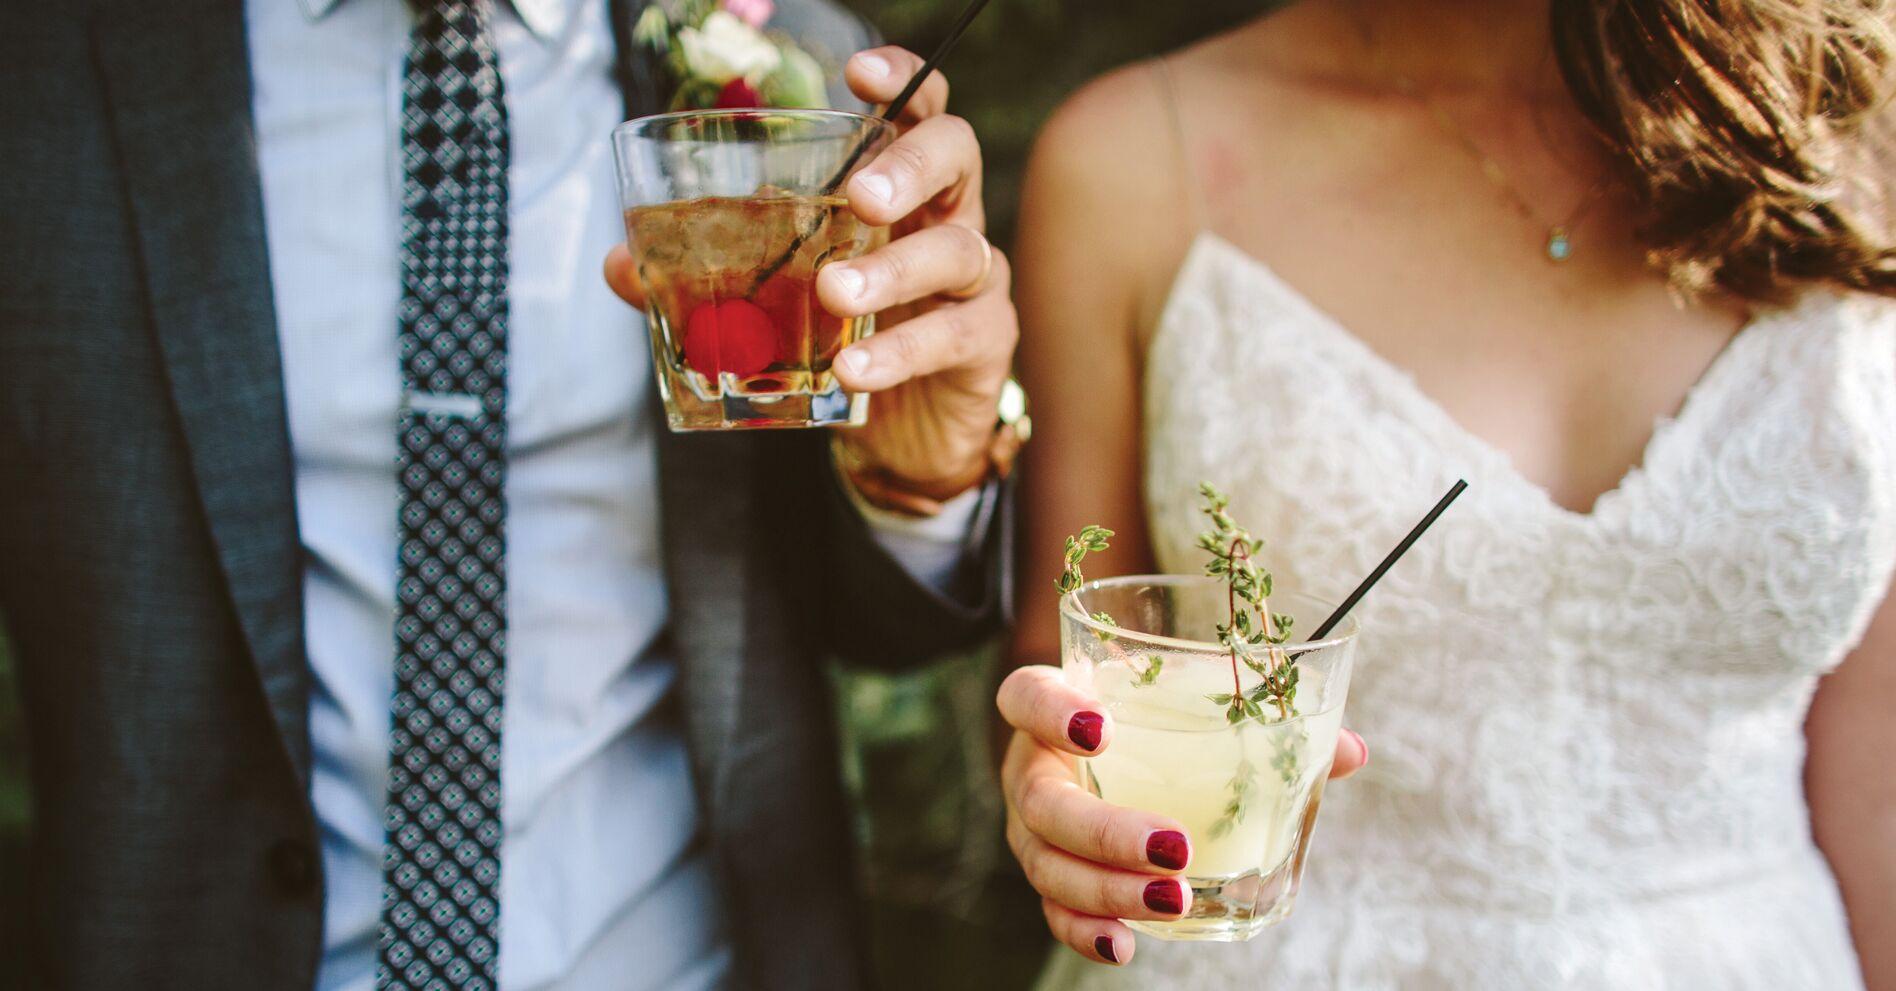 Average Monetary Gift For A Wedding: Alcohol For My Wedding: How Much Does Wedding Alcohol Cost?